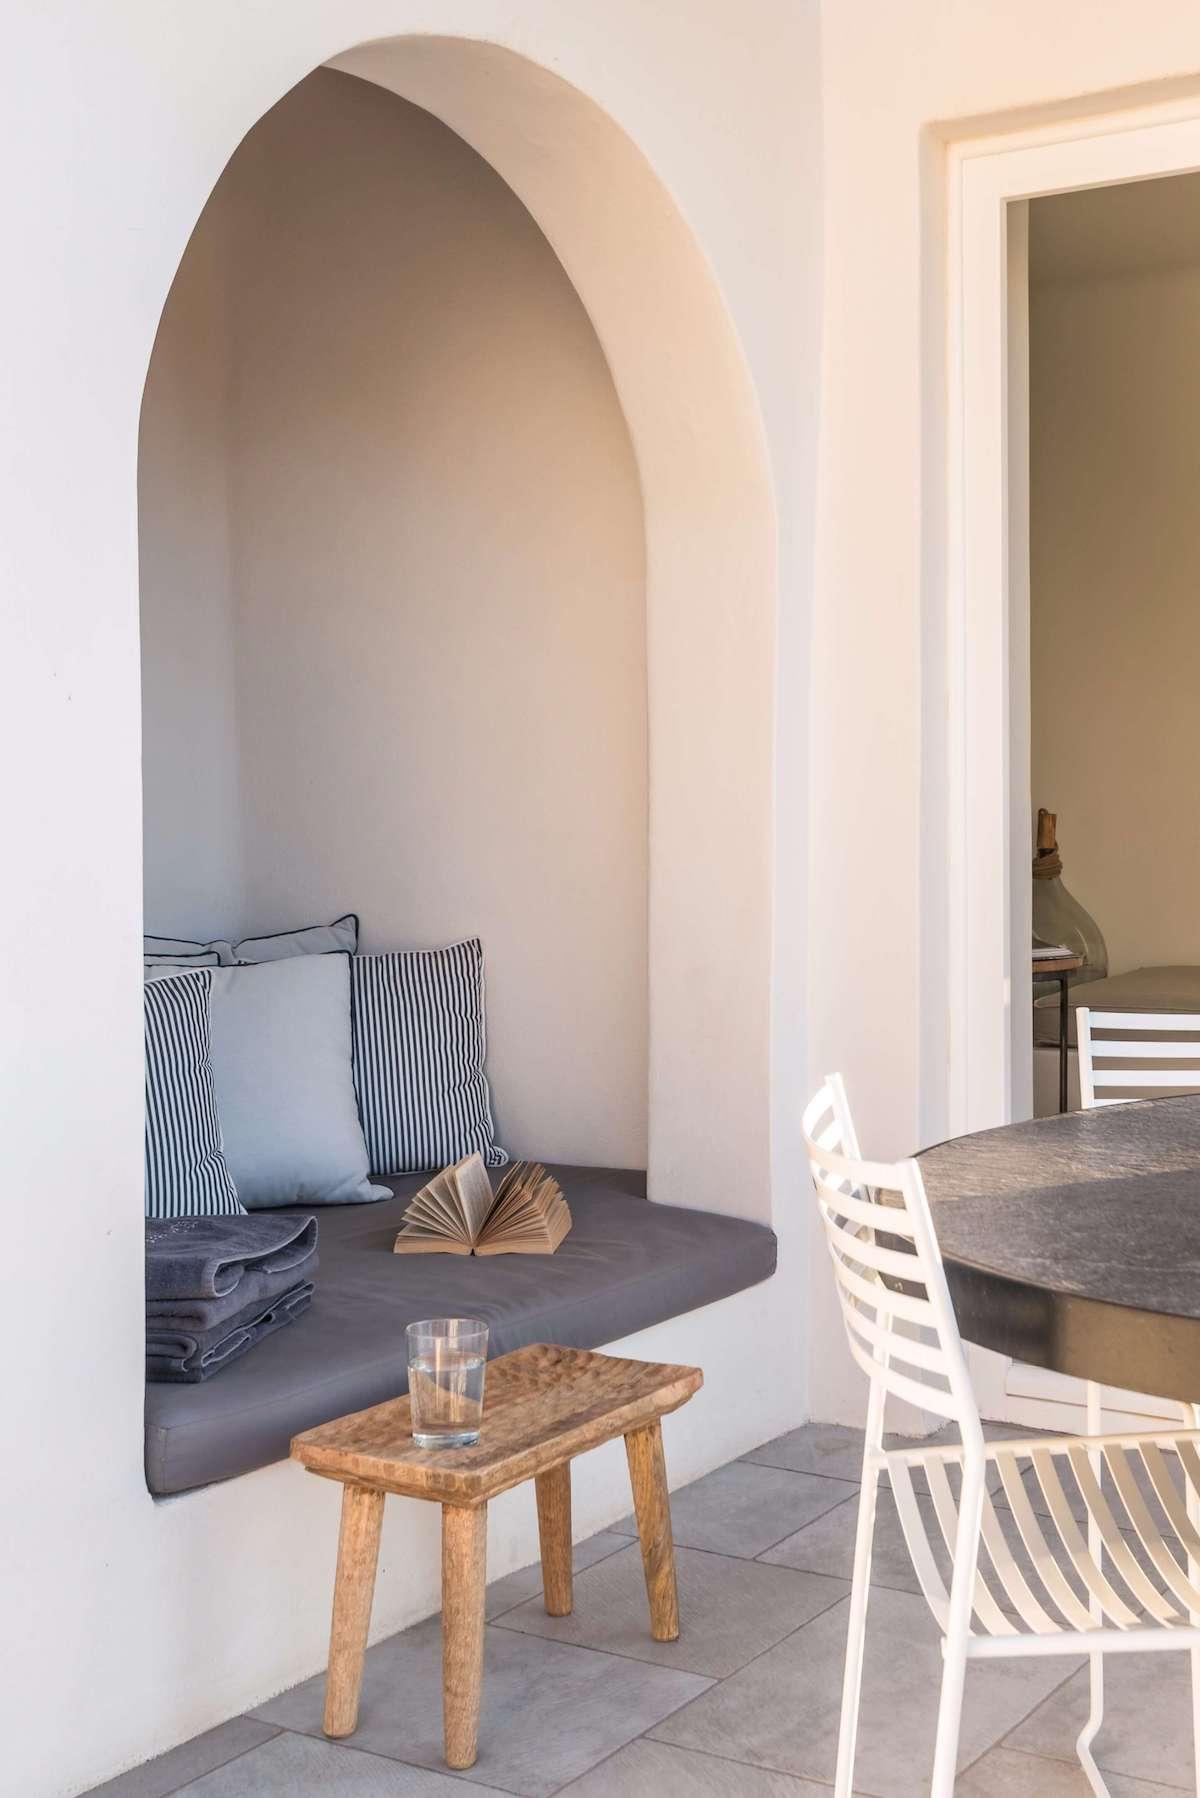 maison style grecque terrasse coin cosy alcove patio coussin rayé bleu blanc